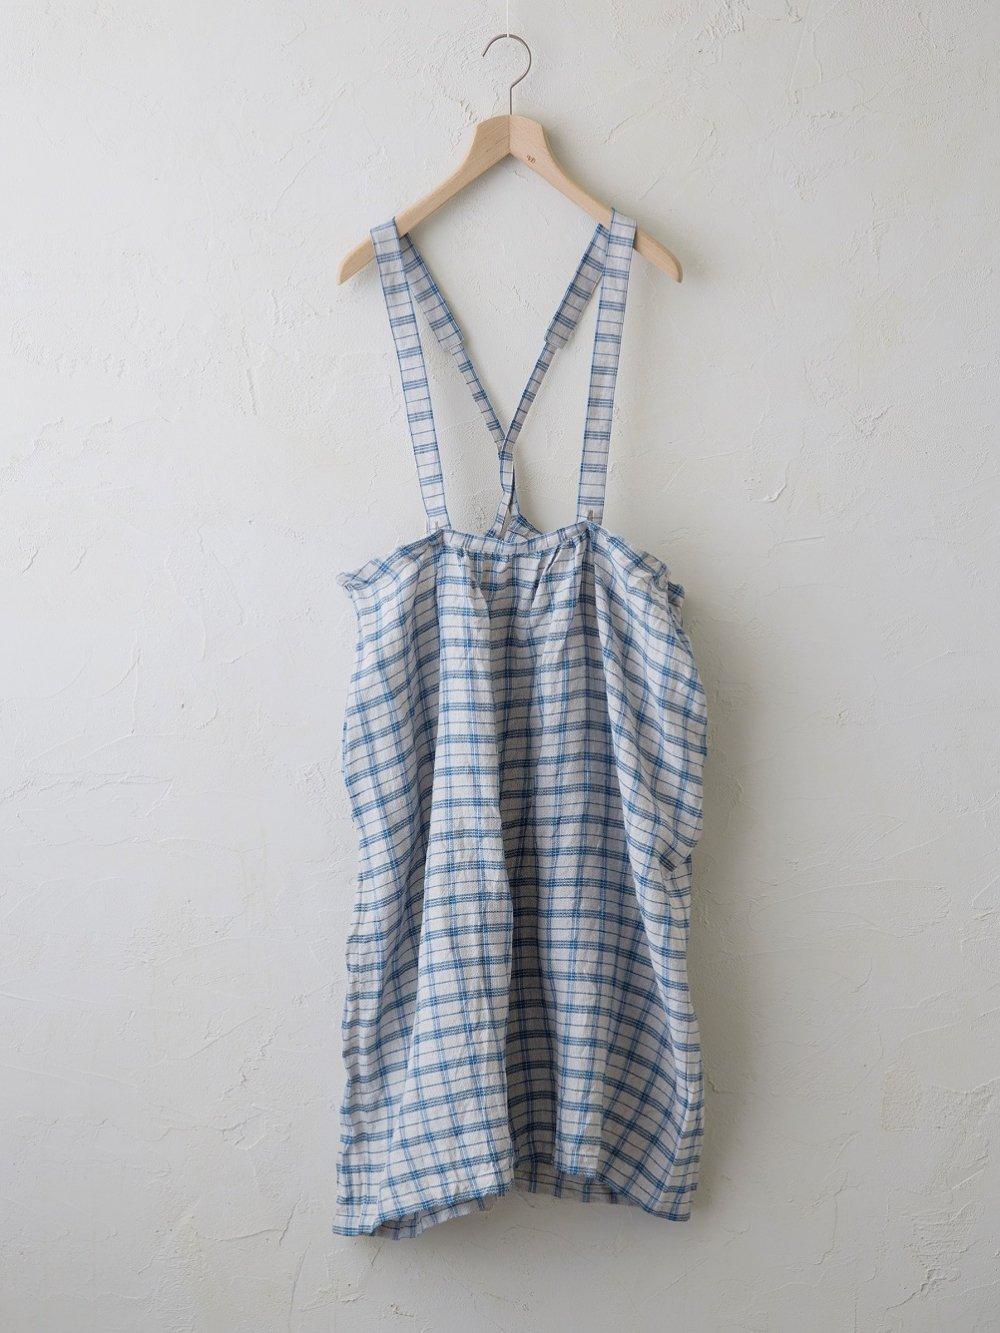 Vintage Check(ドビー+平織) ジャンパースカート